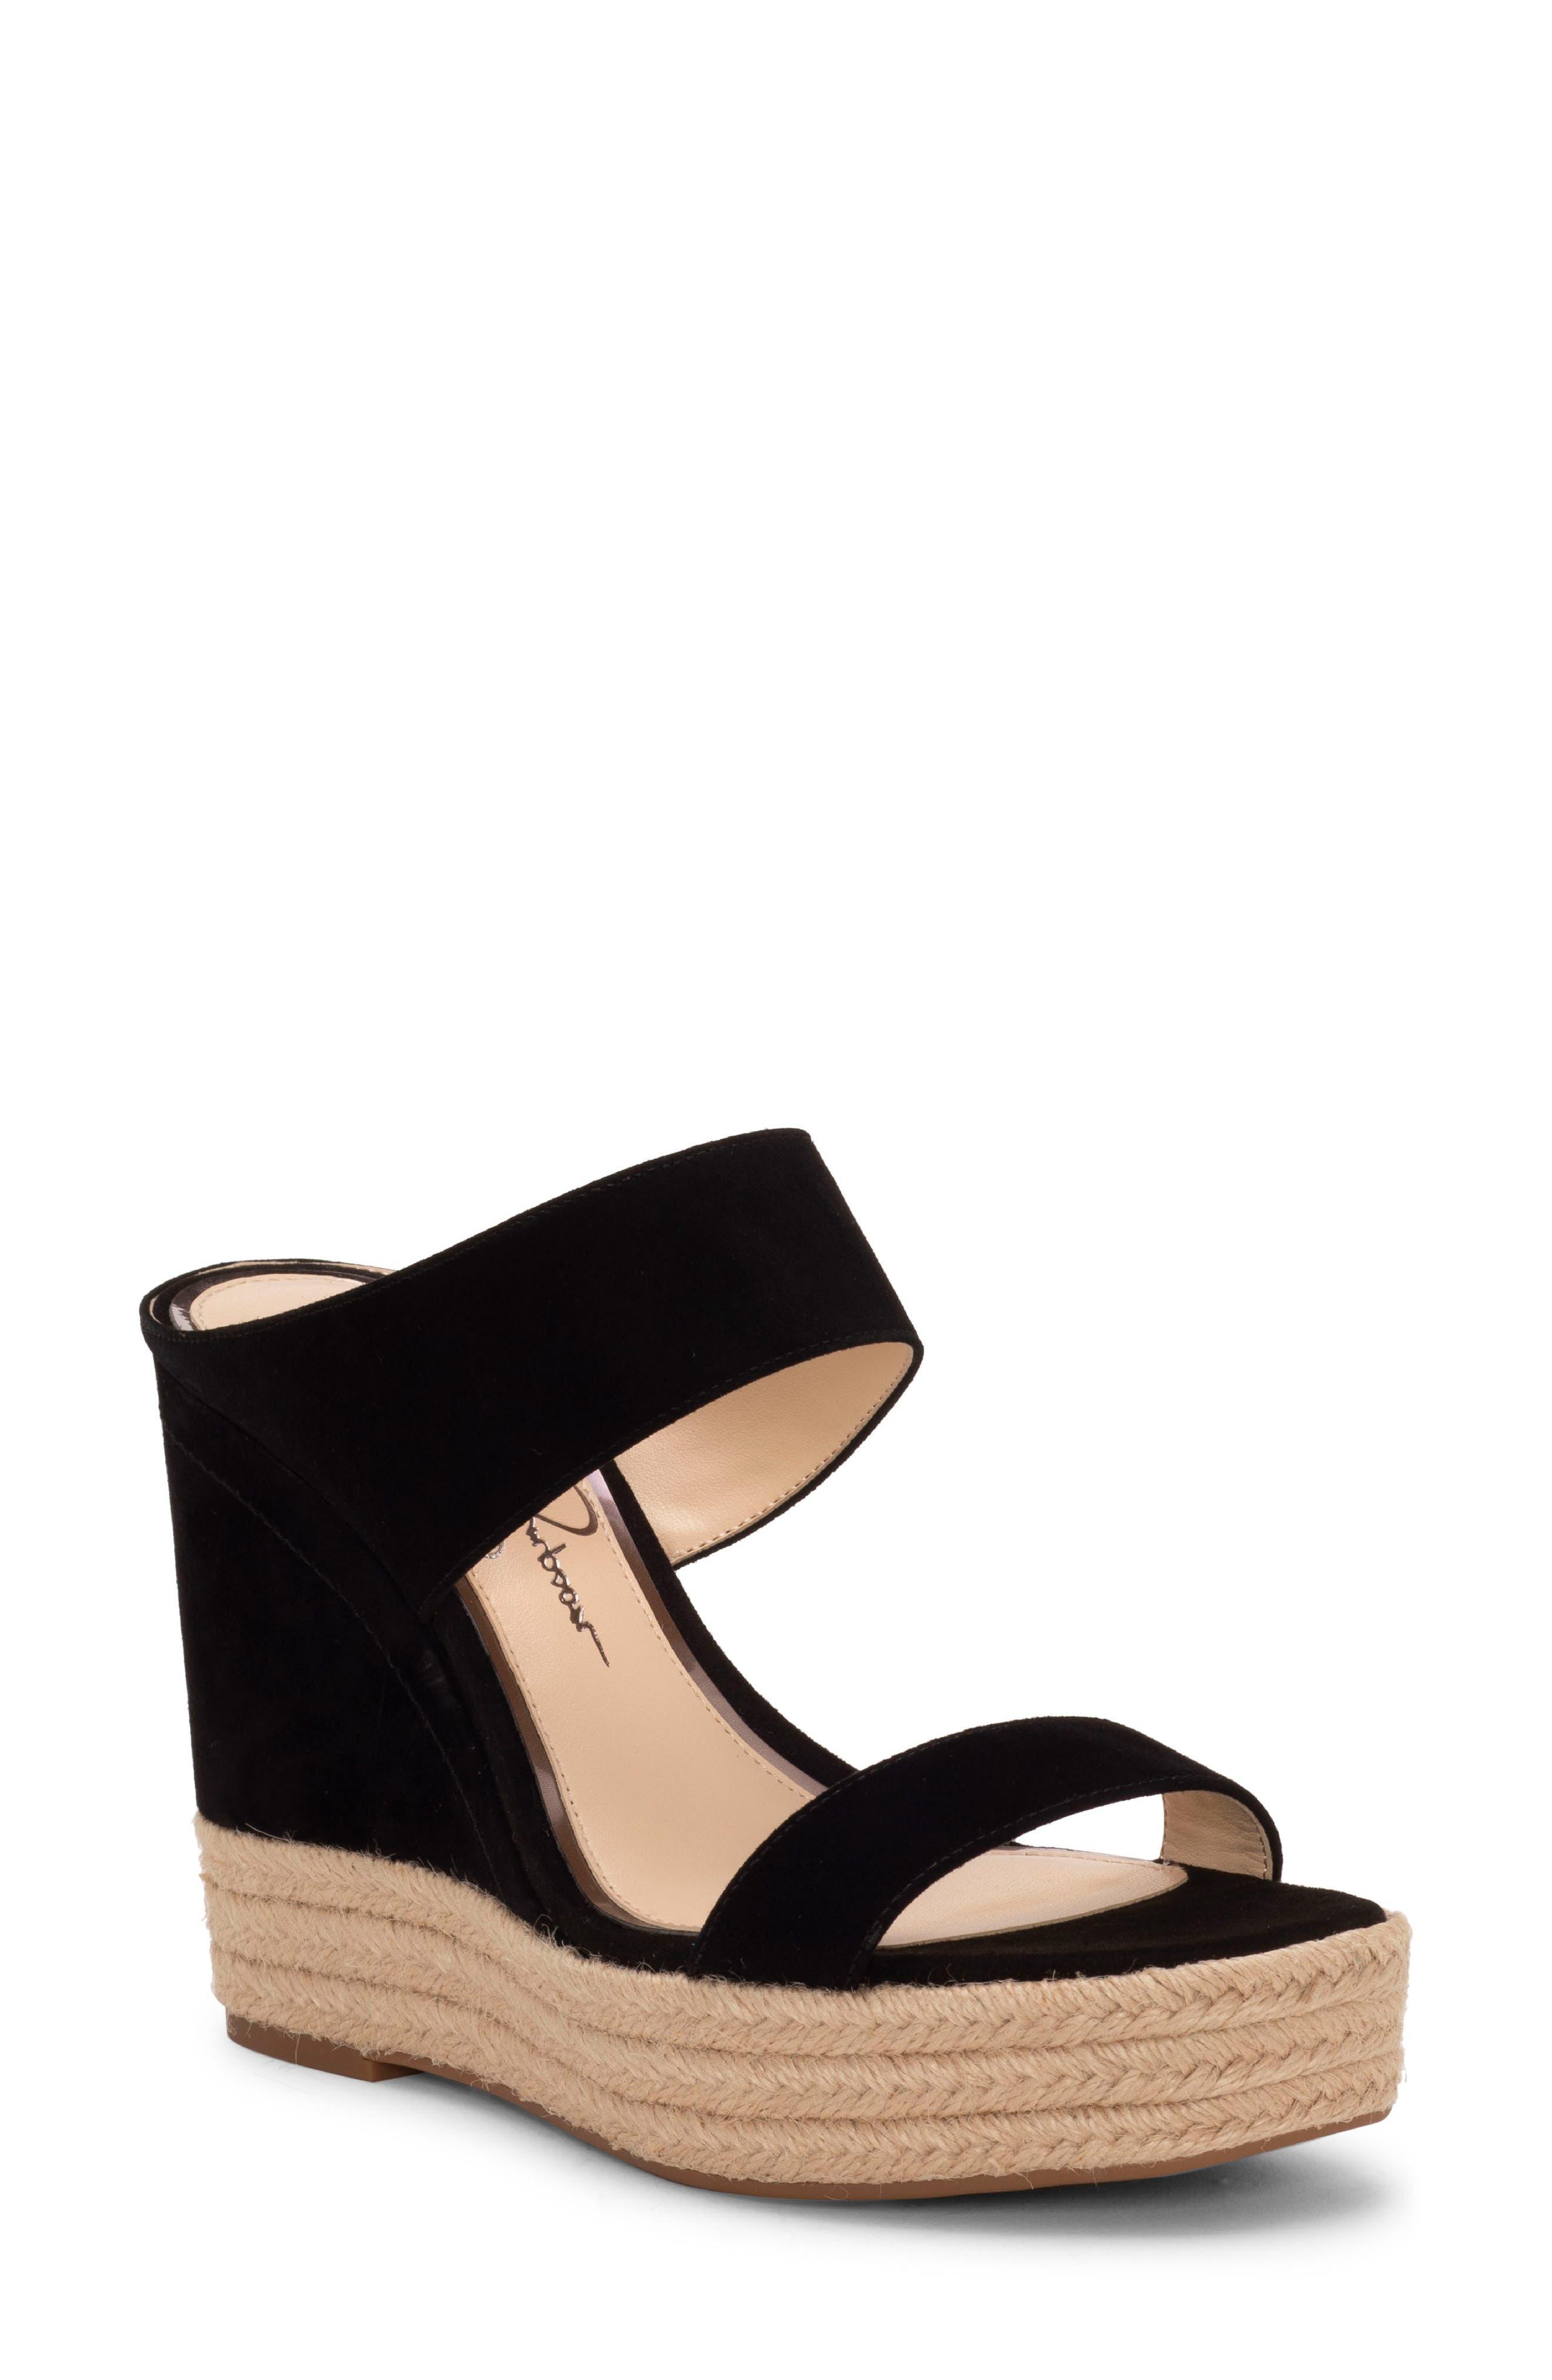 Siera Espadrille Wedge Slide Sandal, Main, color, BLACK